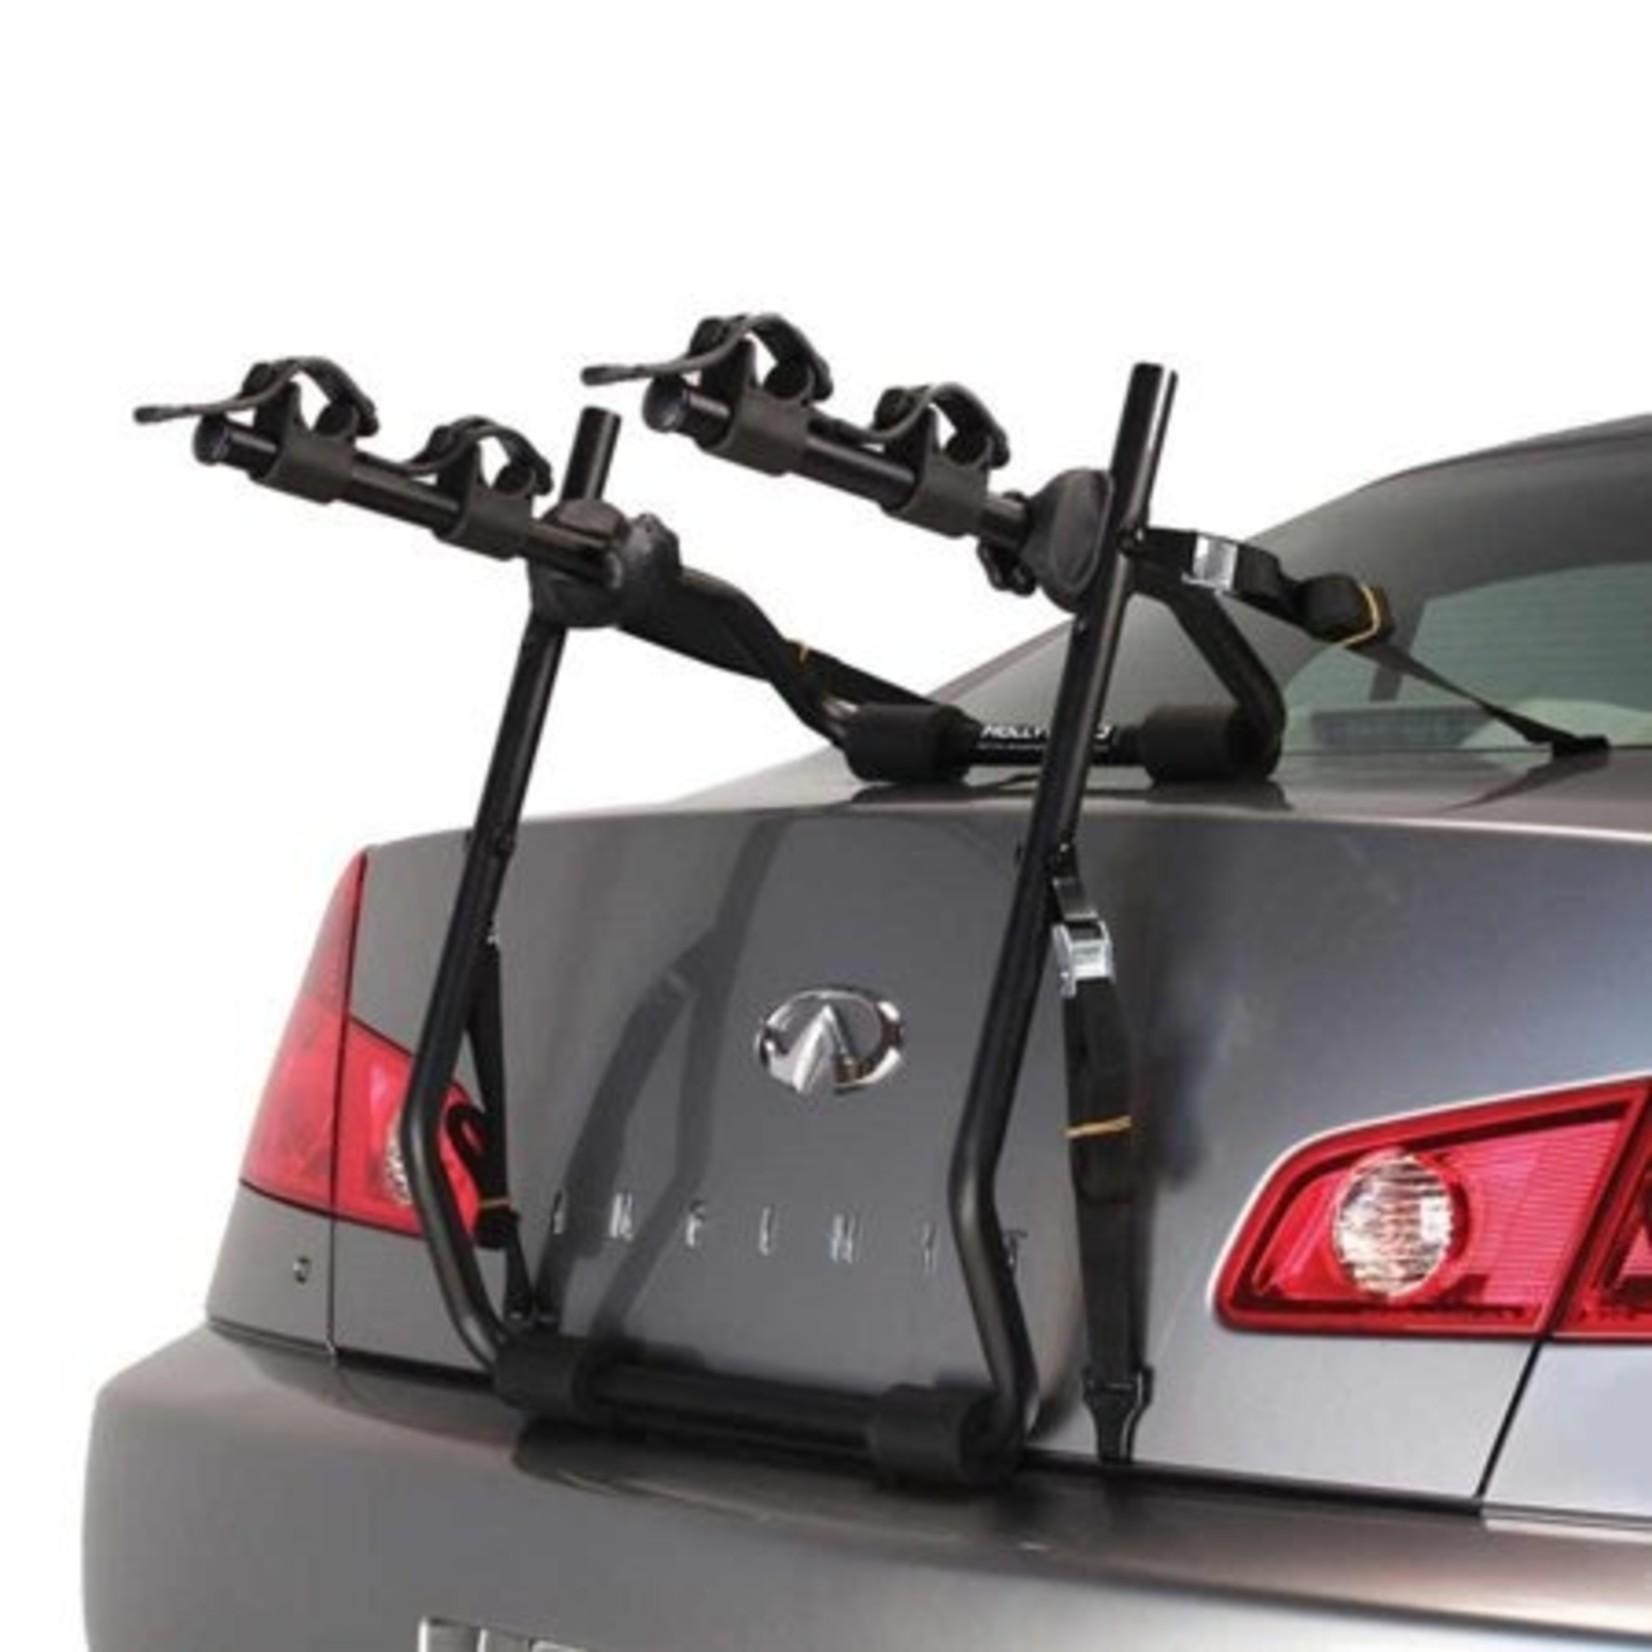 Hollywood Express Trunk Rack - 2-Bike